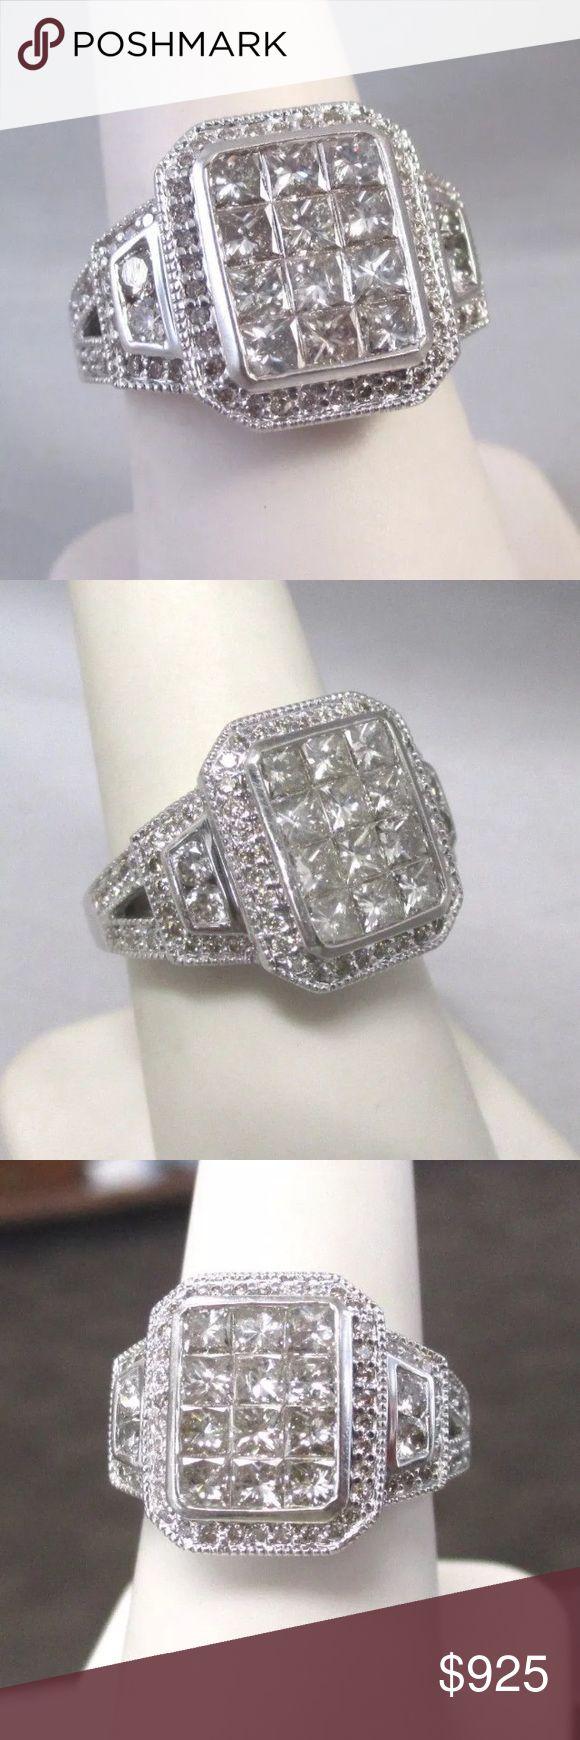 Amazing 2.10 carat 10k white gold diamond ring Amazing 2.10 carat 10k white gold diamond ring Jewelry Rings